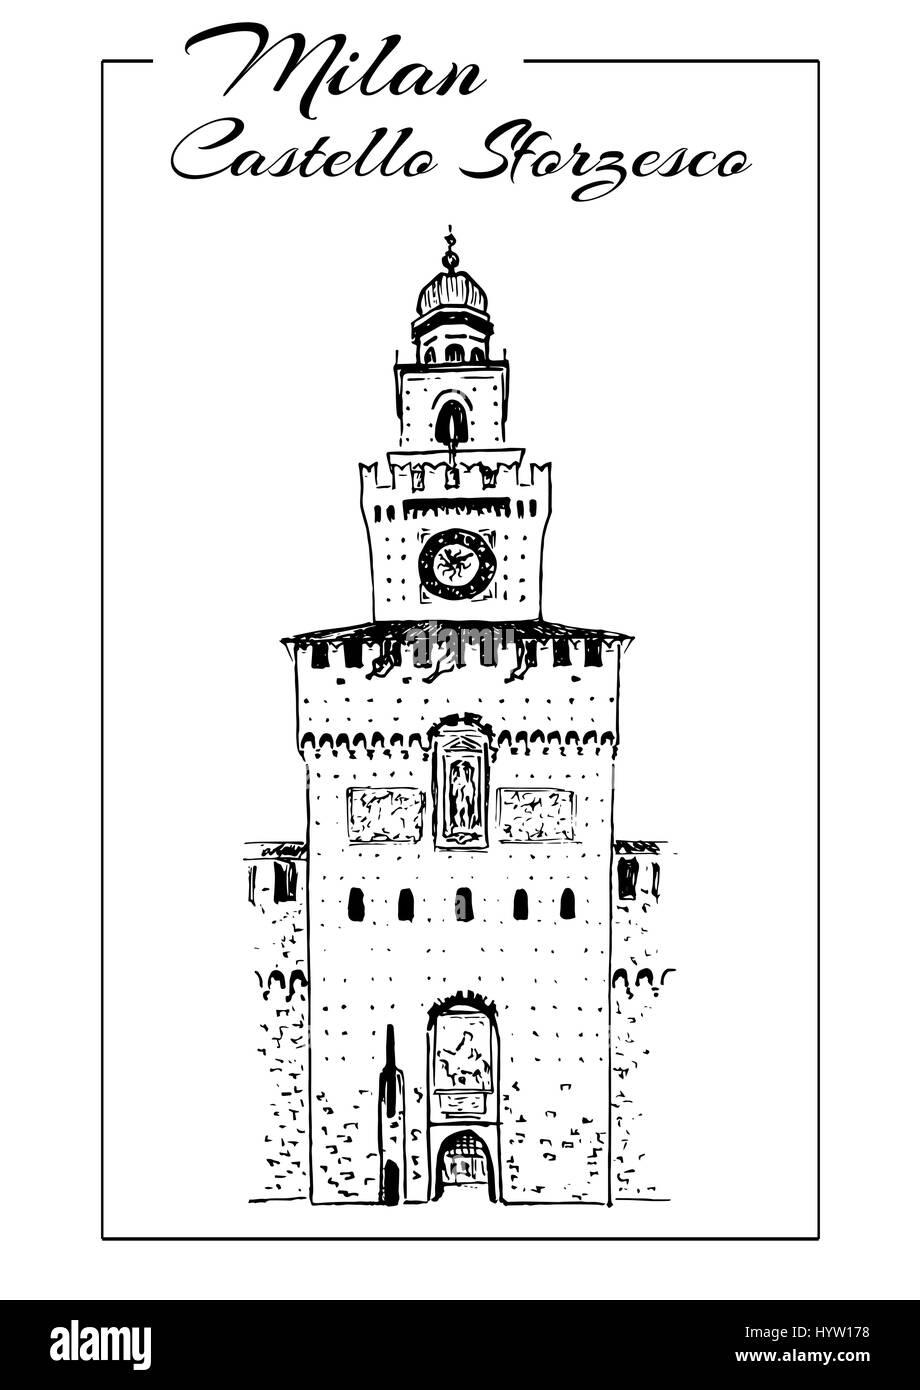 Milan symbols. Teatro alla Scala, Sforza Castle or Castello Sforzesco. Italy sightseeing. Medieval castle in Milan. - Stock Image